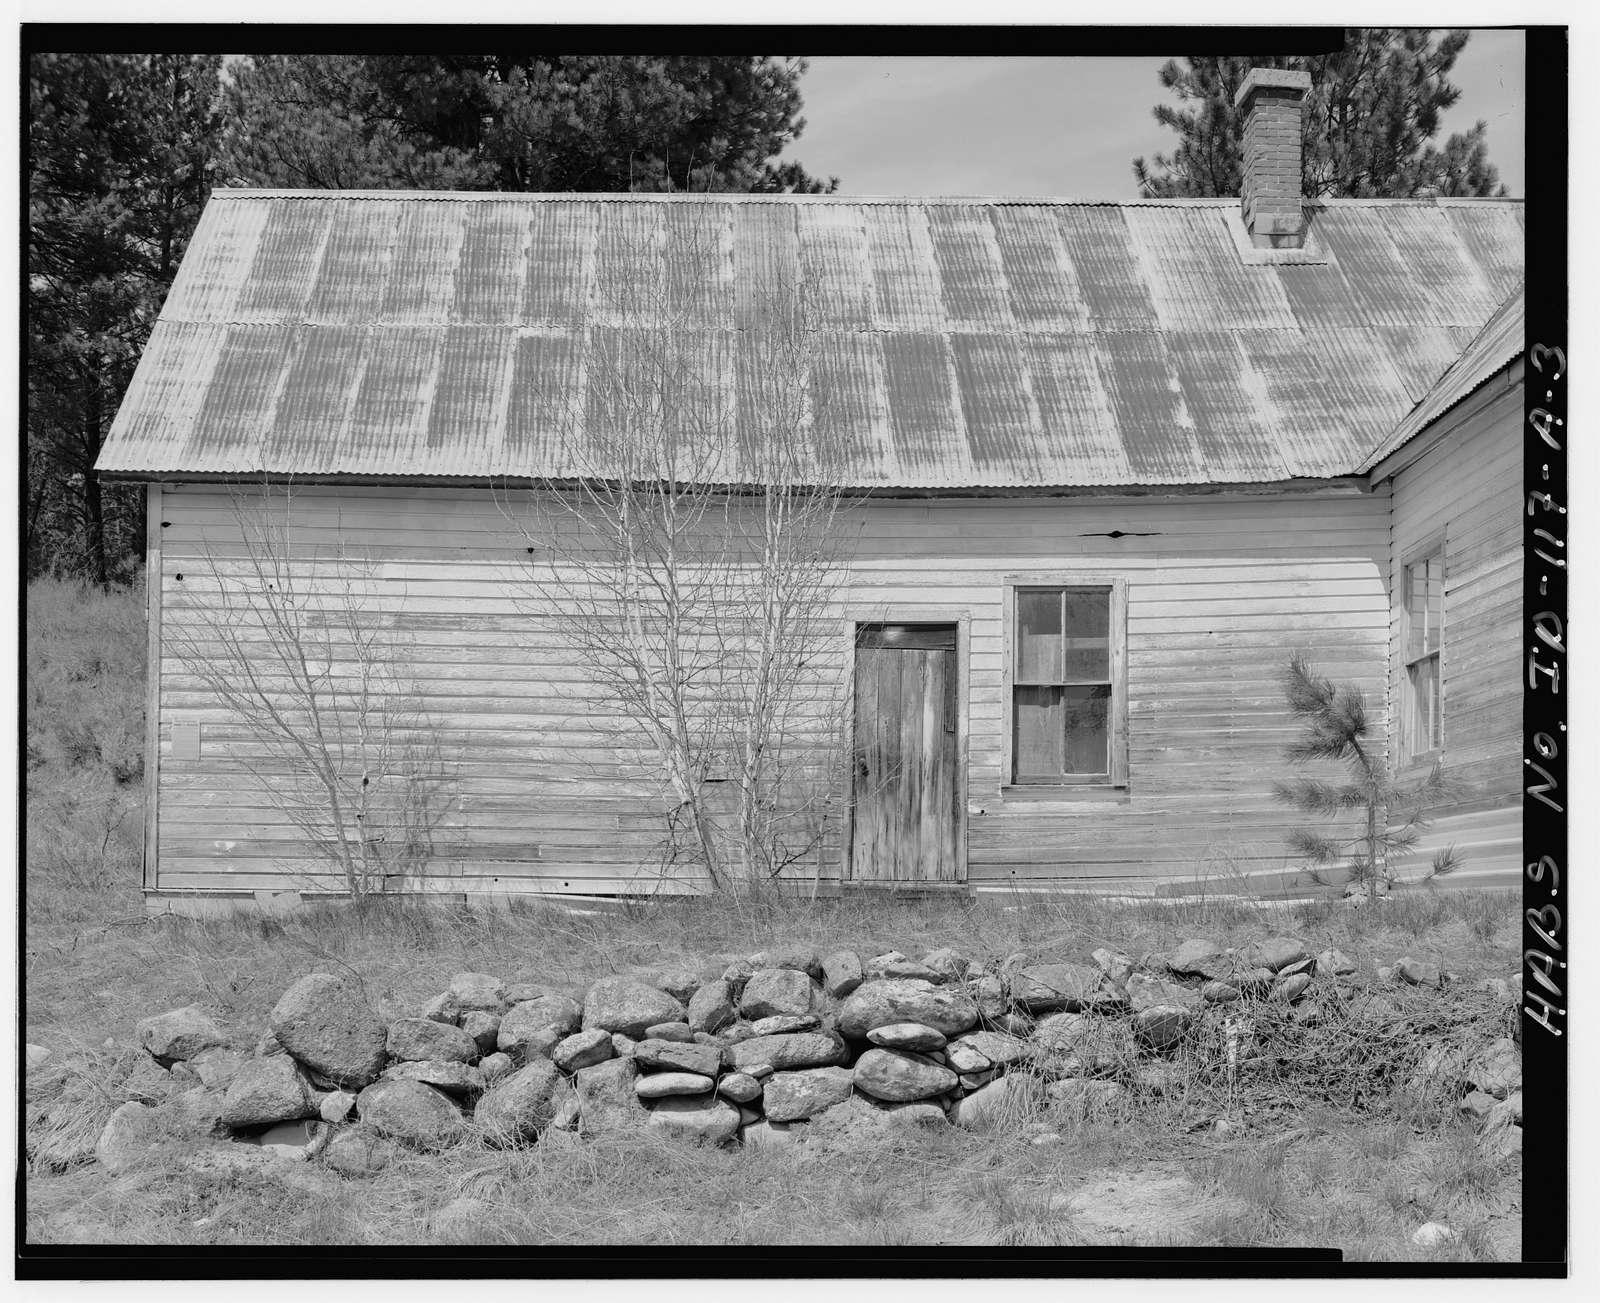 Hiatt Property, House, West bank of Woof Creek, 400 feet northwest of intersection of U.S.F.S. Roads 651 & 349, Placerville, Boise County, ID